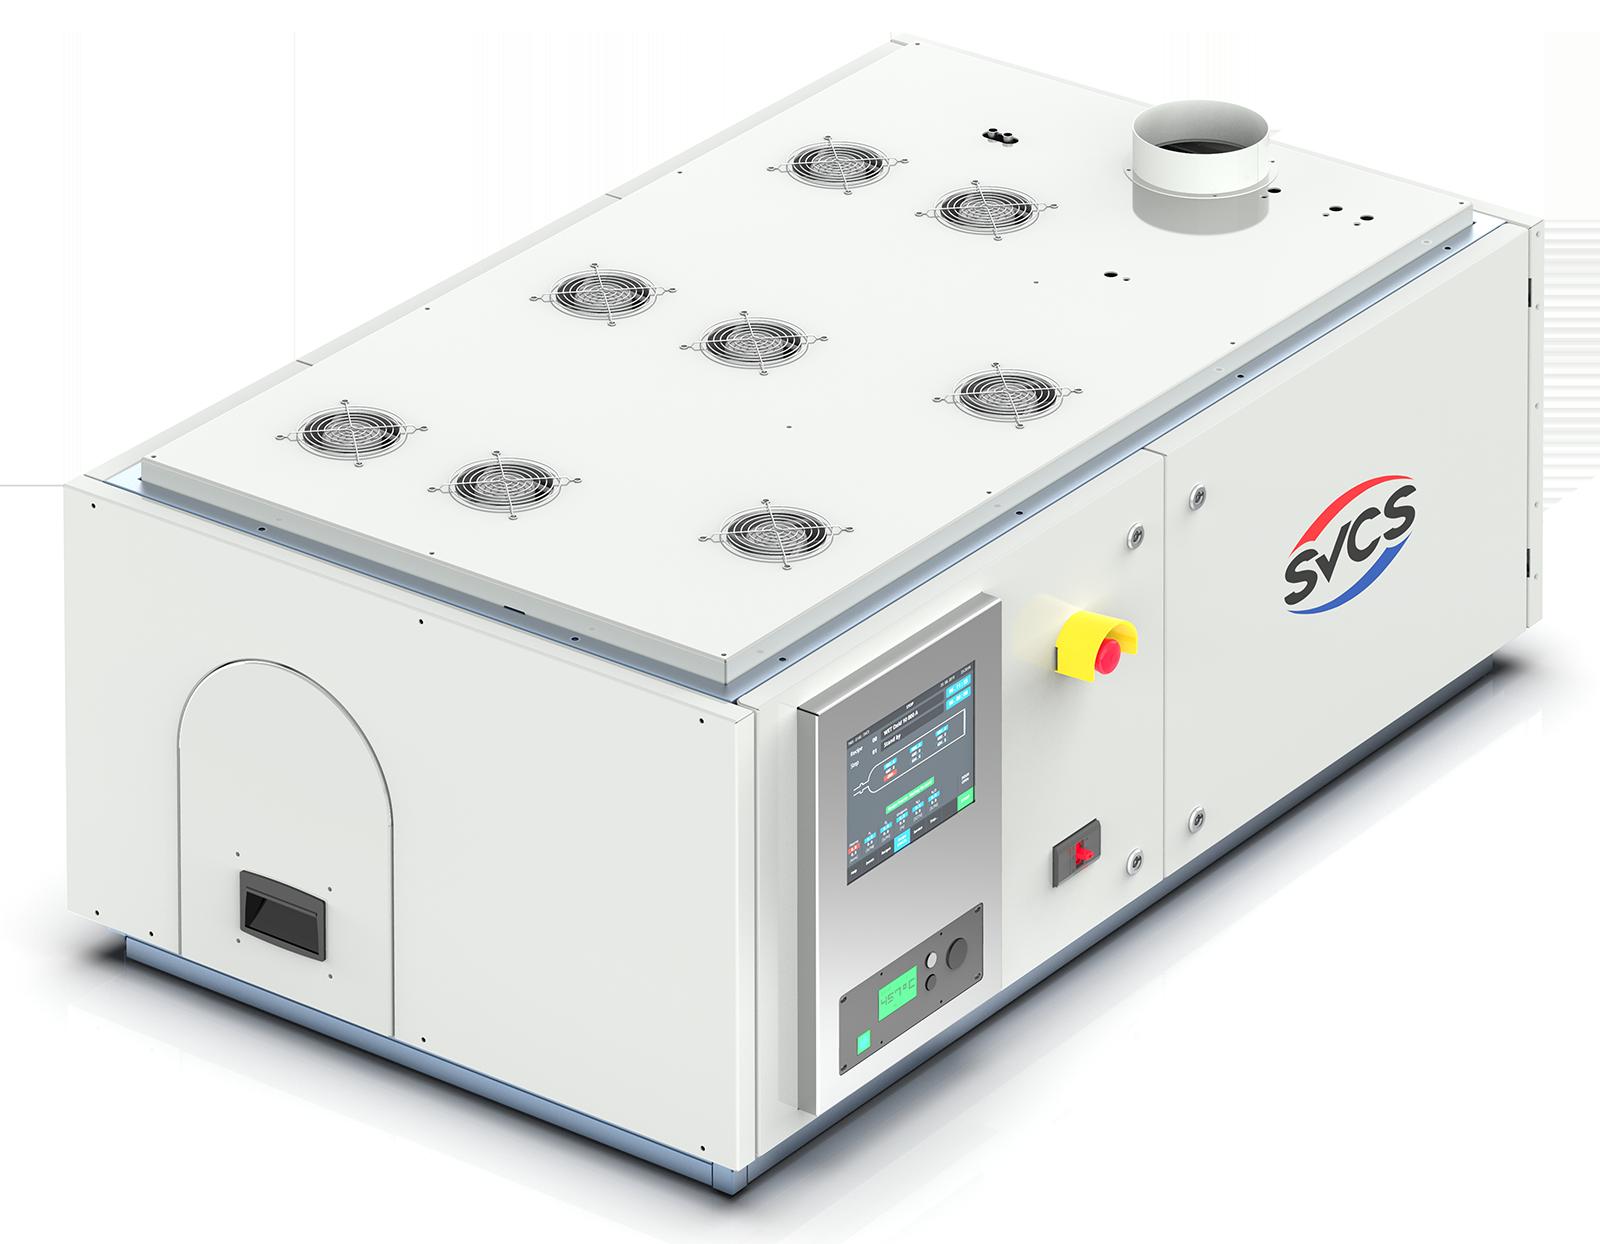 https://www.empbv.com/wp-content/uploads/2020/05/svcs_compact-tabletop-furnace.png